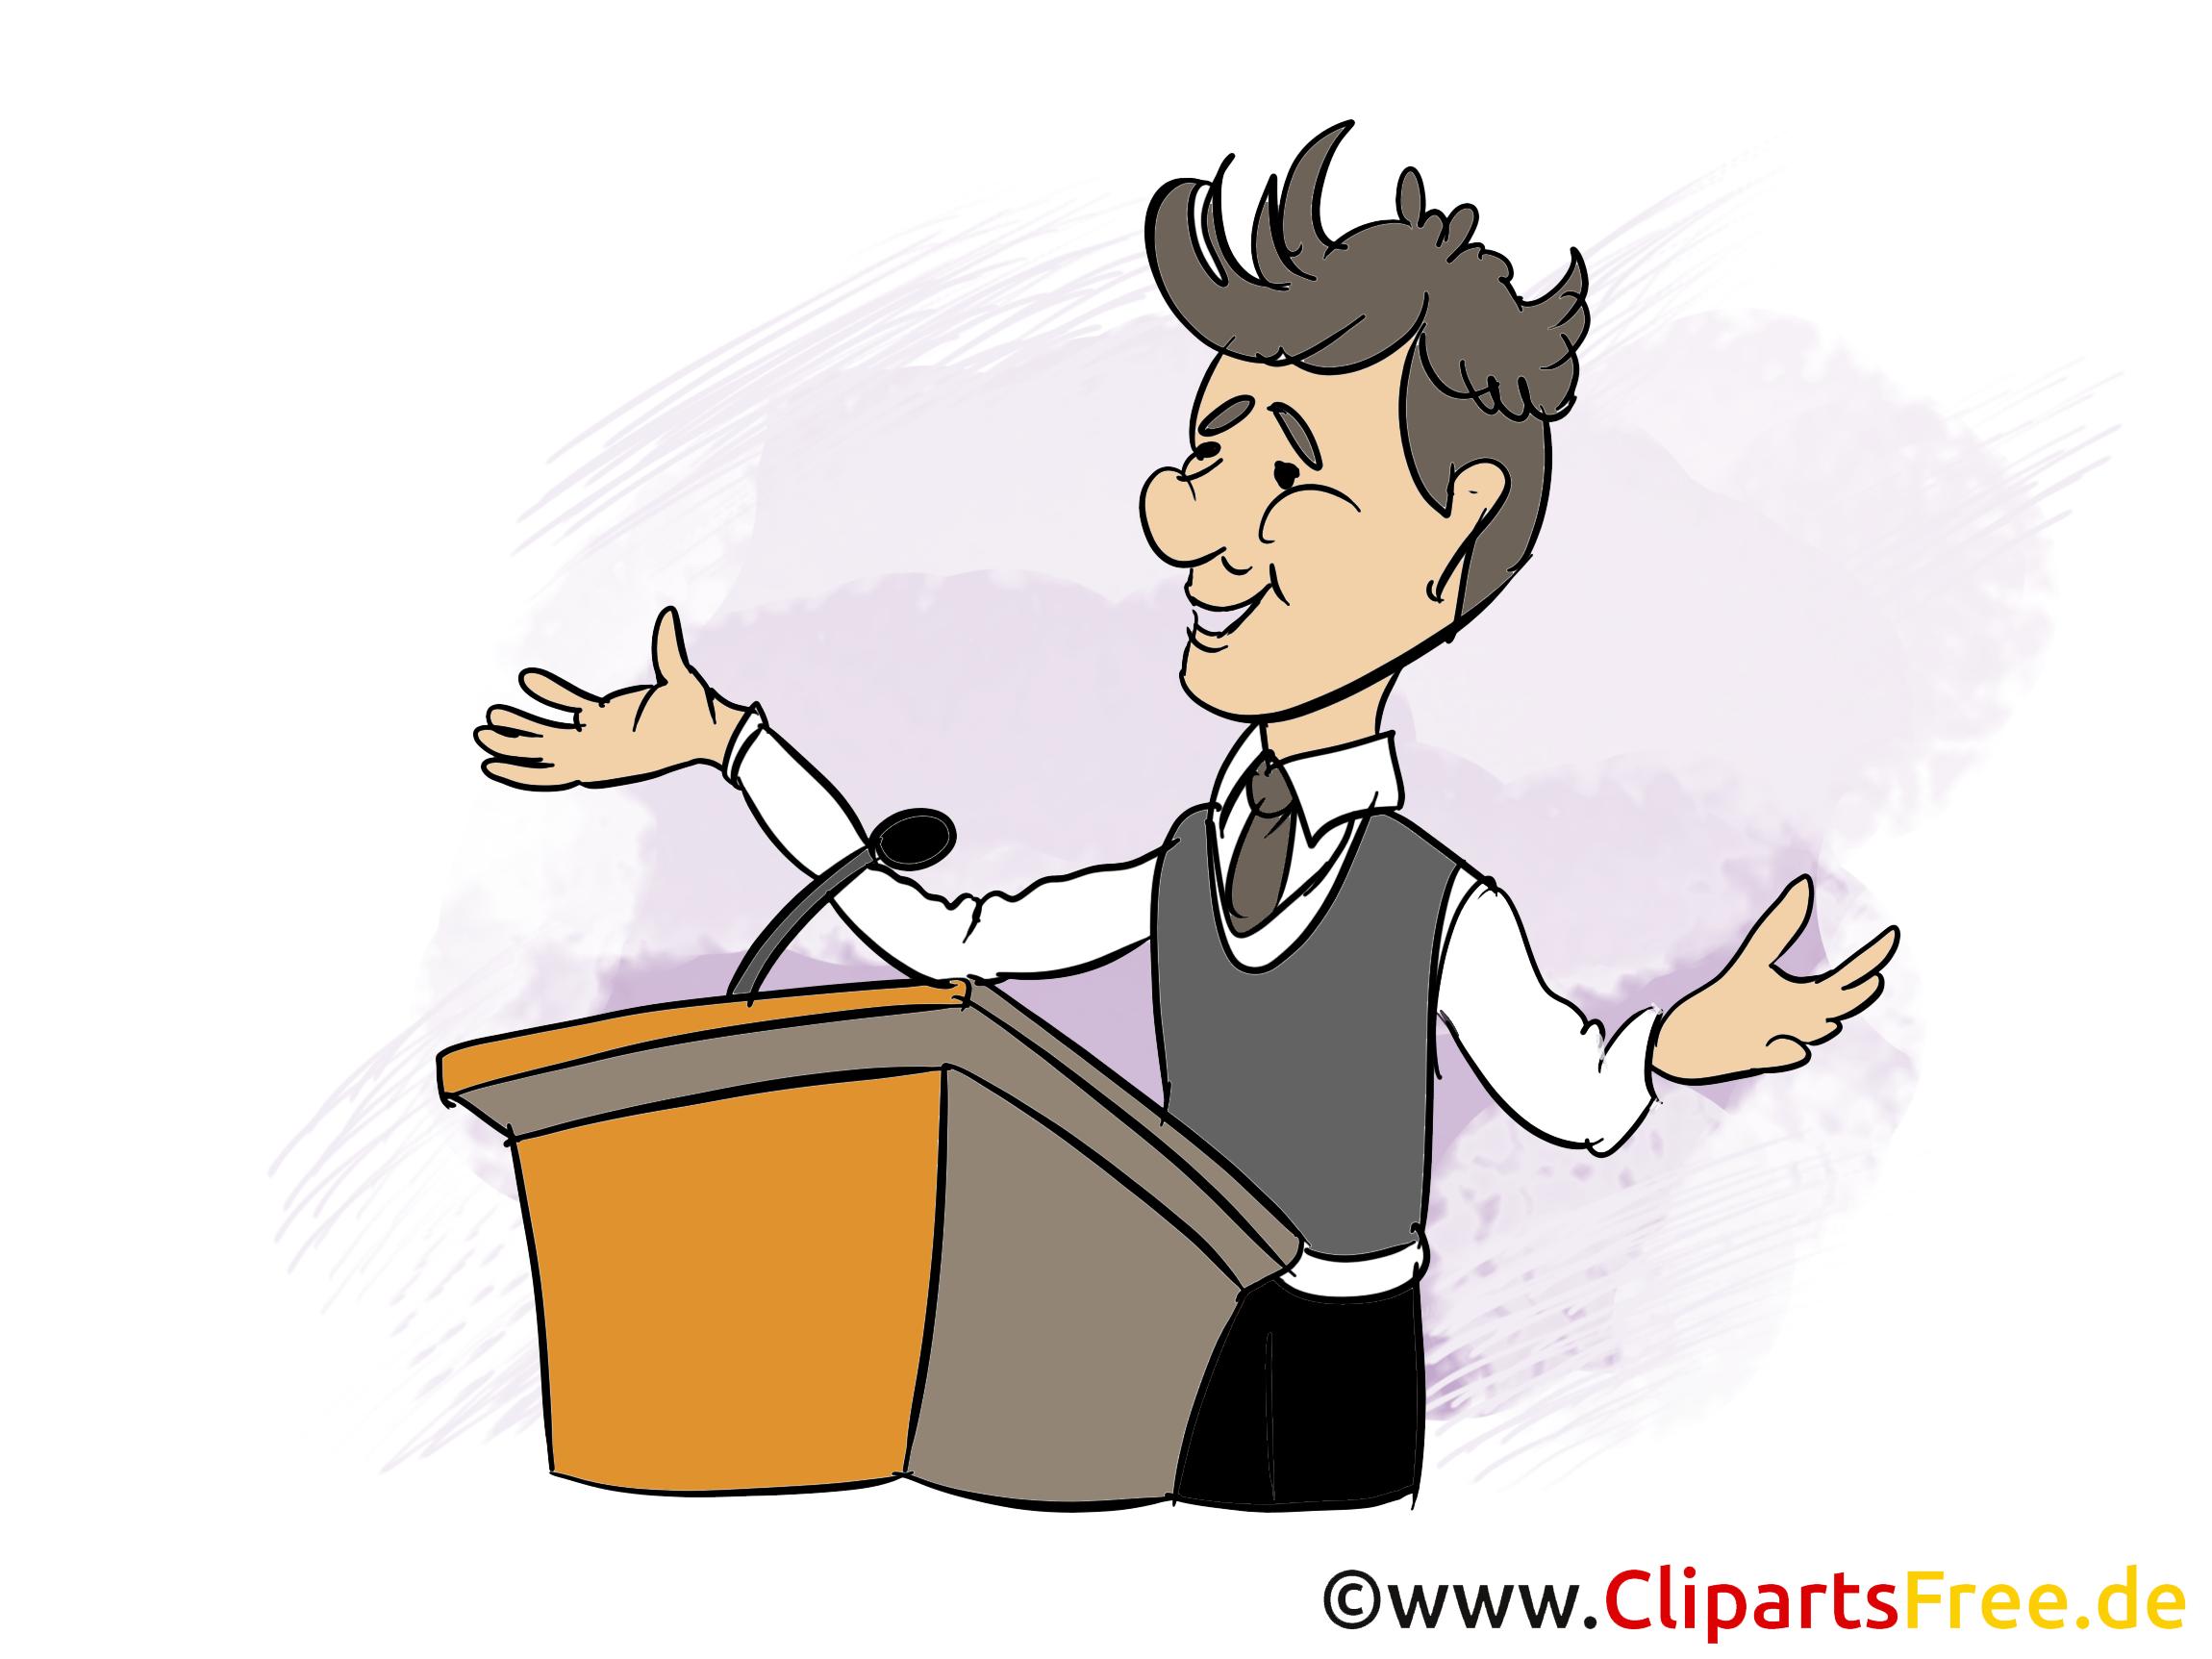 Parteileader Bild, Clipart, Grafik, Cartoon, Illustration